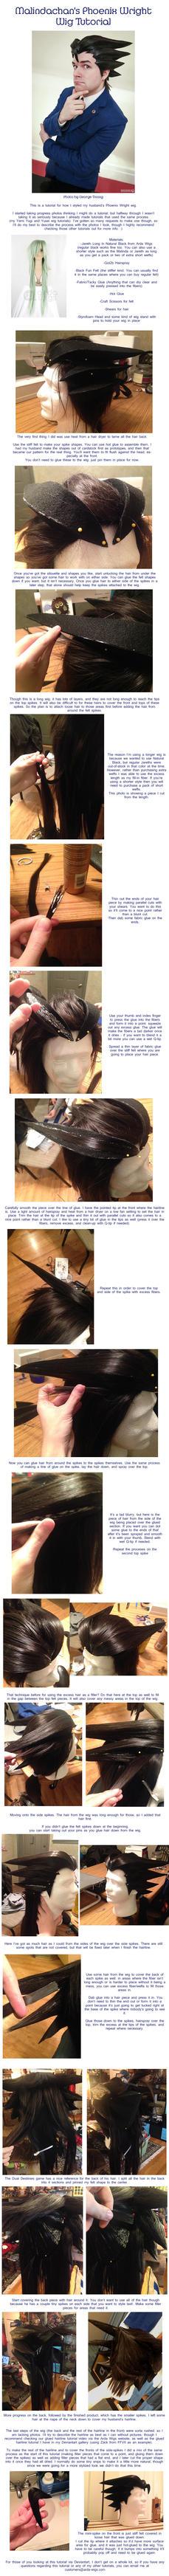 Phoenix Wright Wig Tutorial by Malindachan